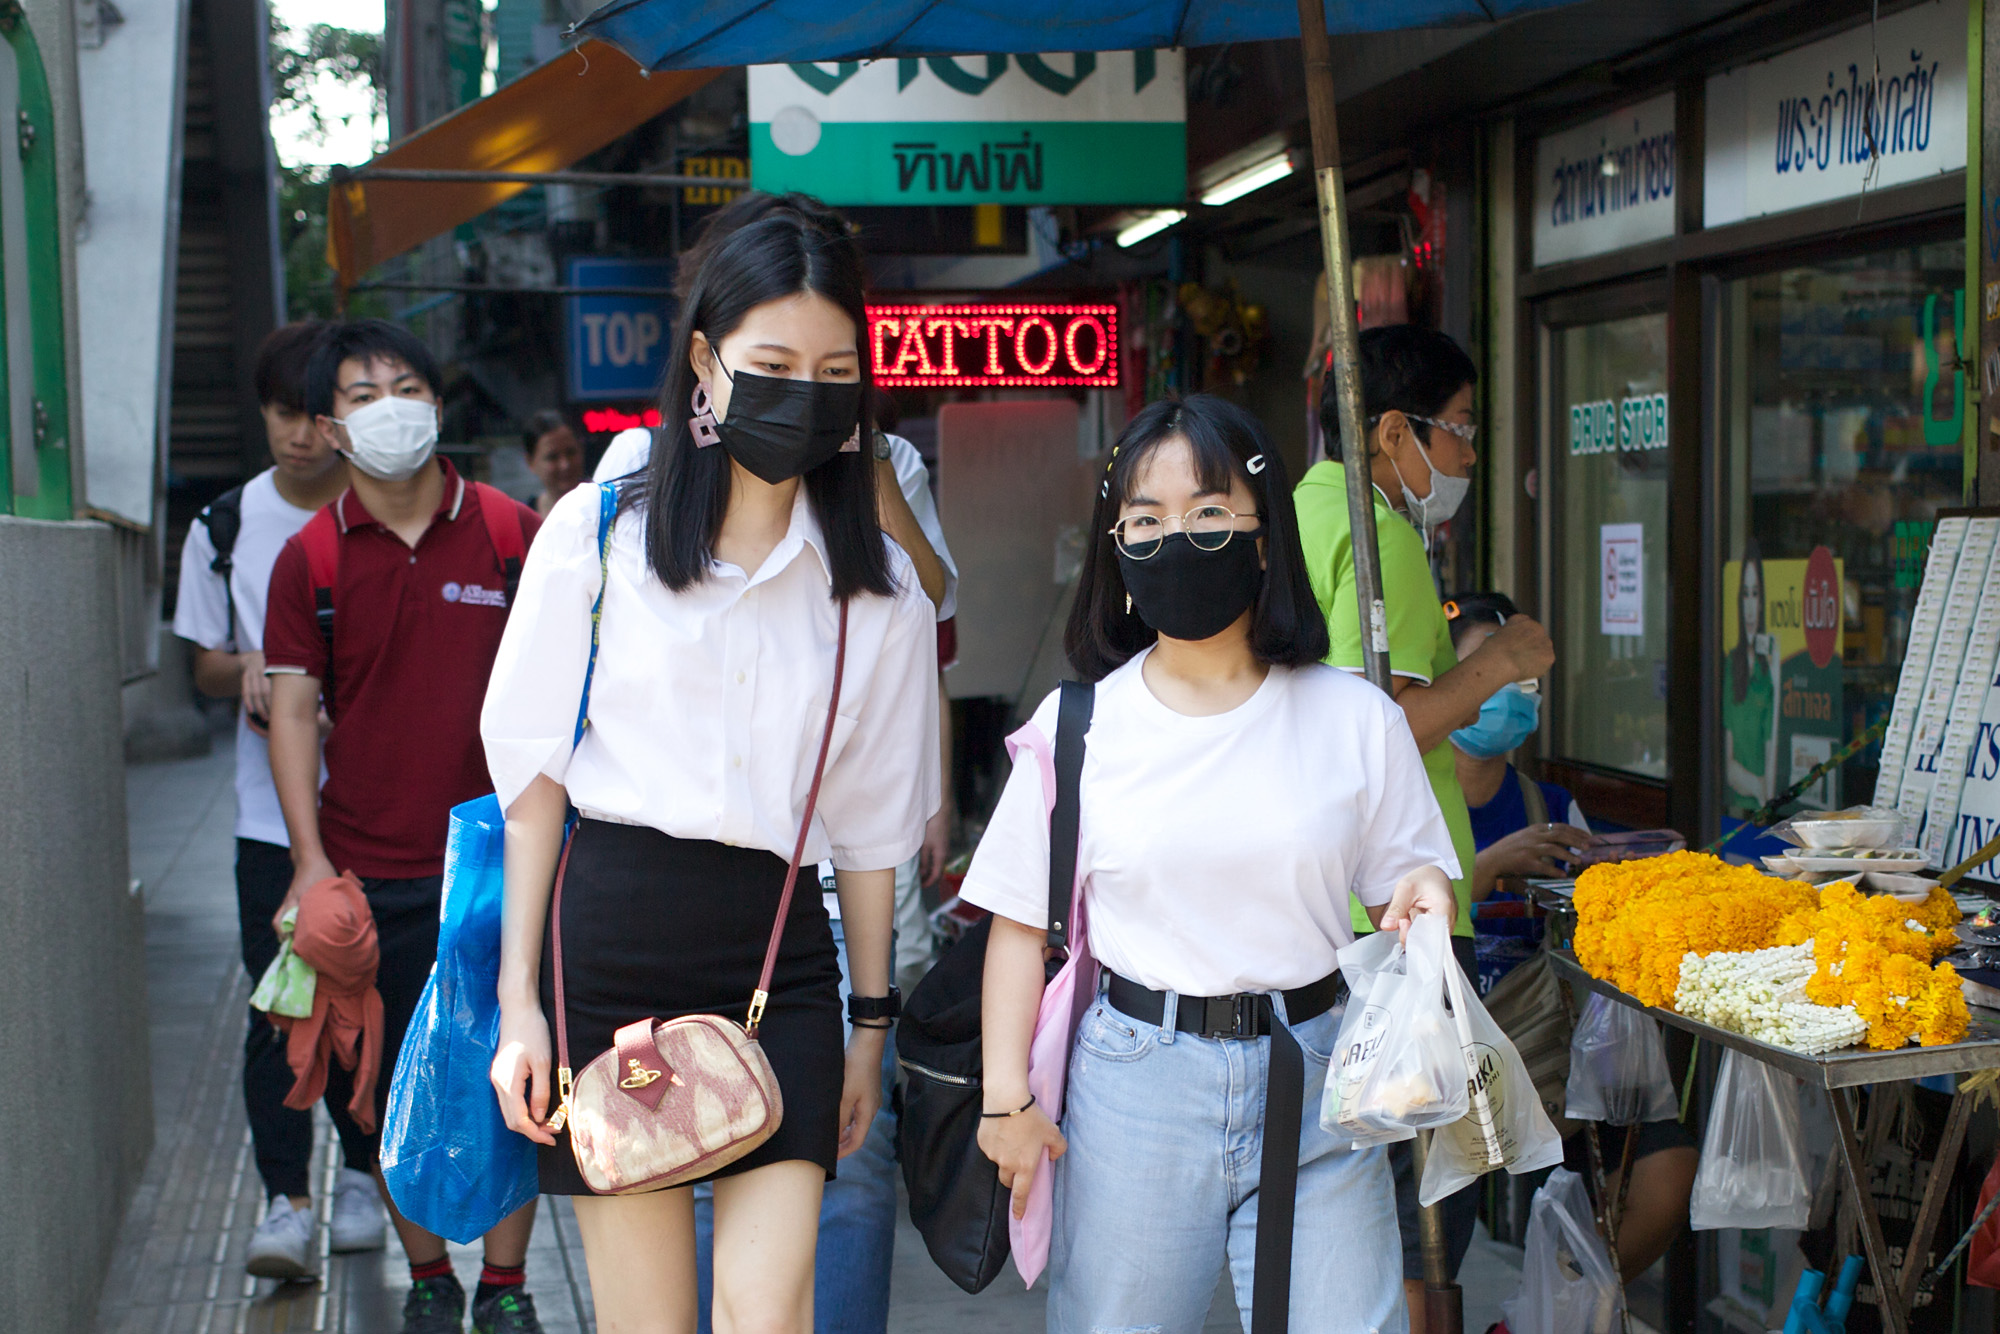 several people wearing masks